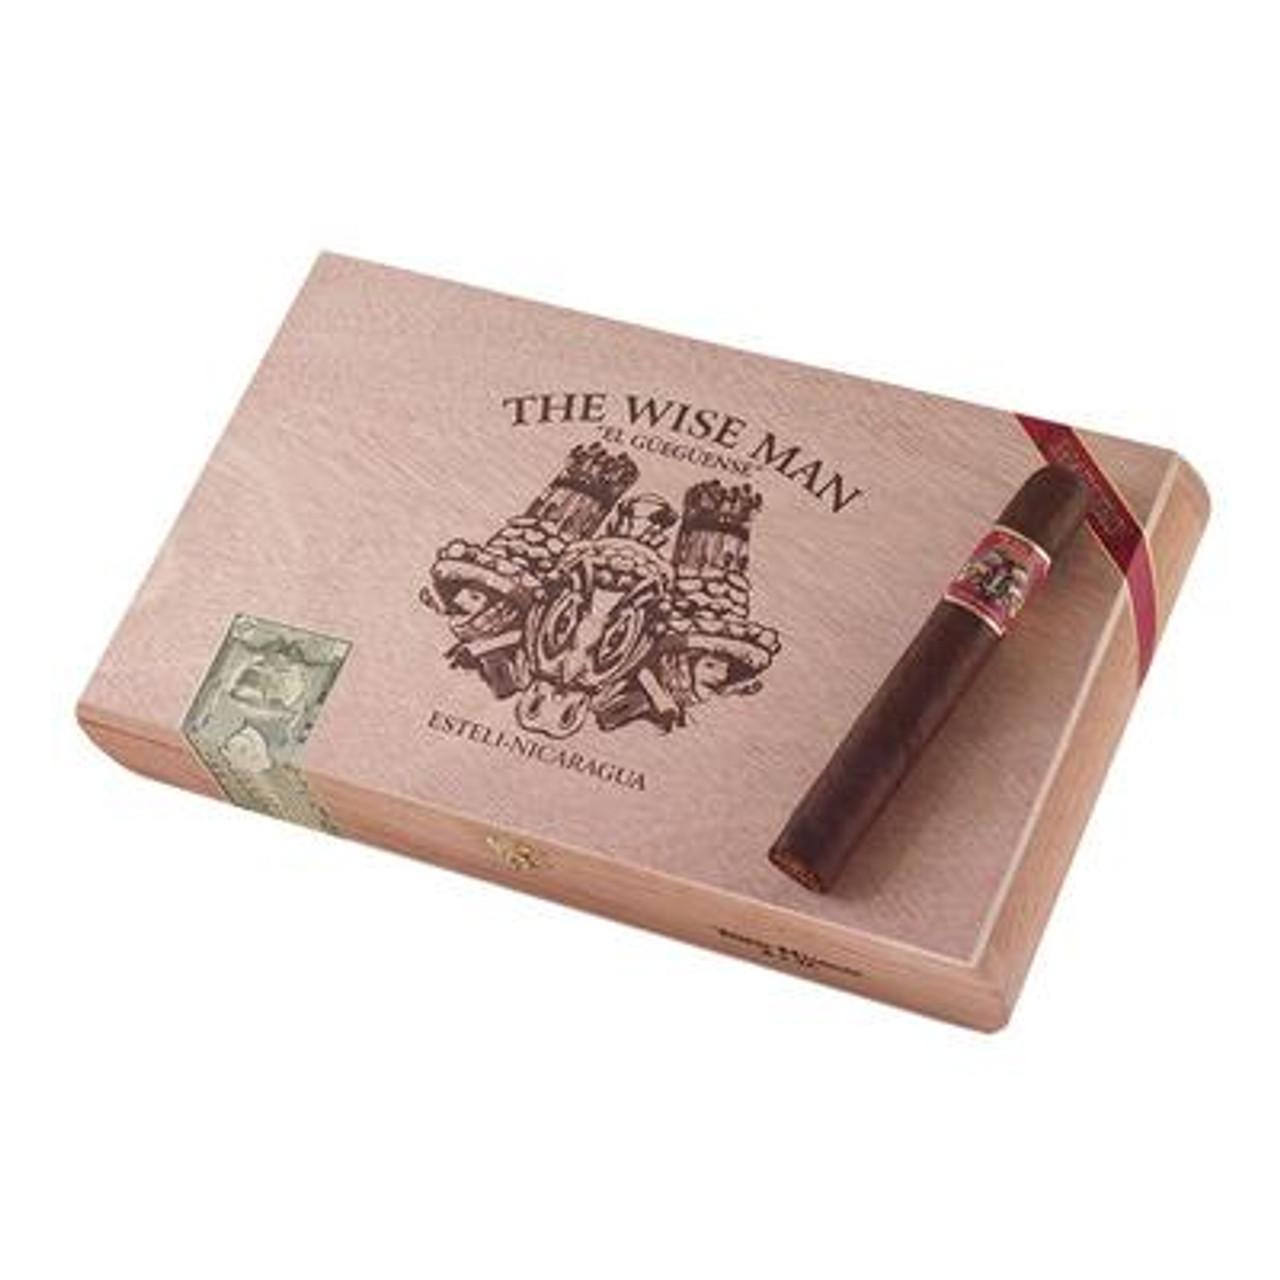 Foundation The Wise Man Maduro Toro Huaco Cigars - 6 x 56 (Box of 25)